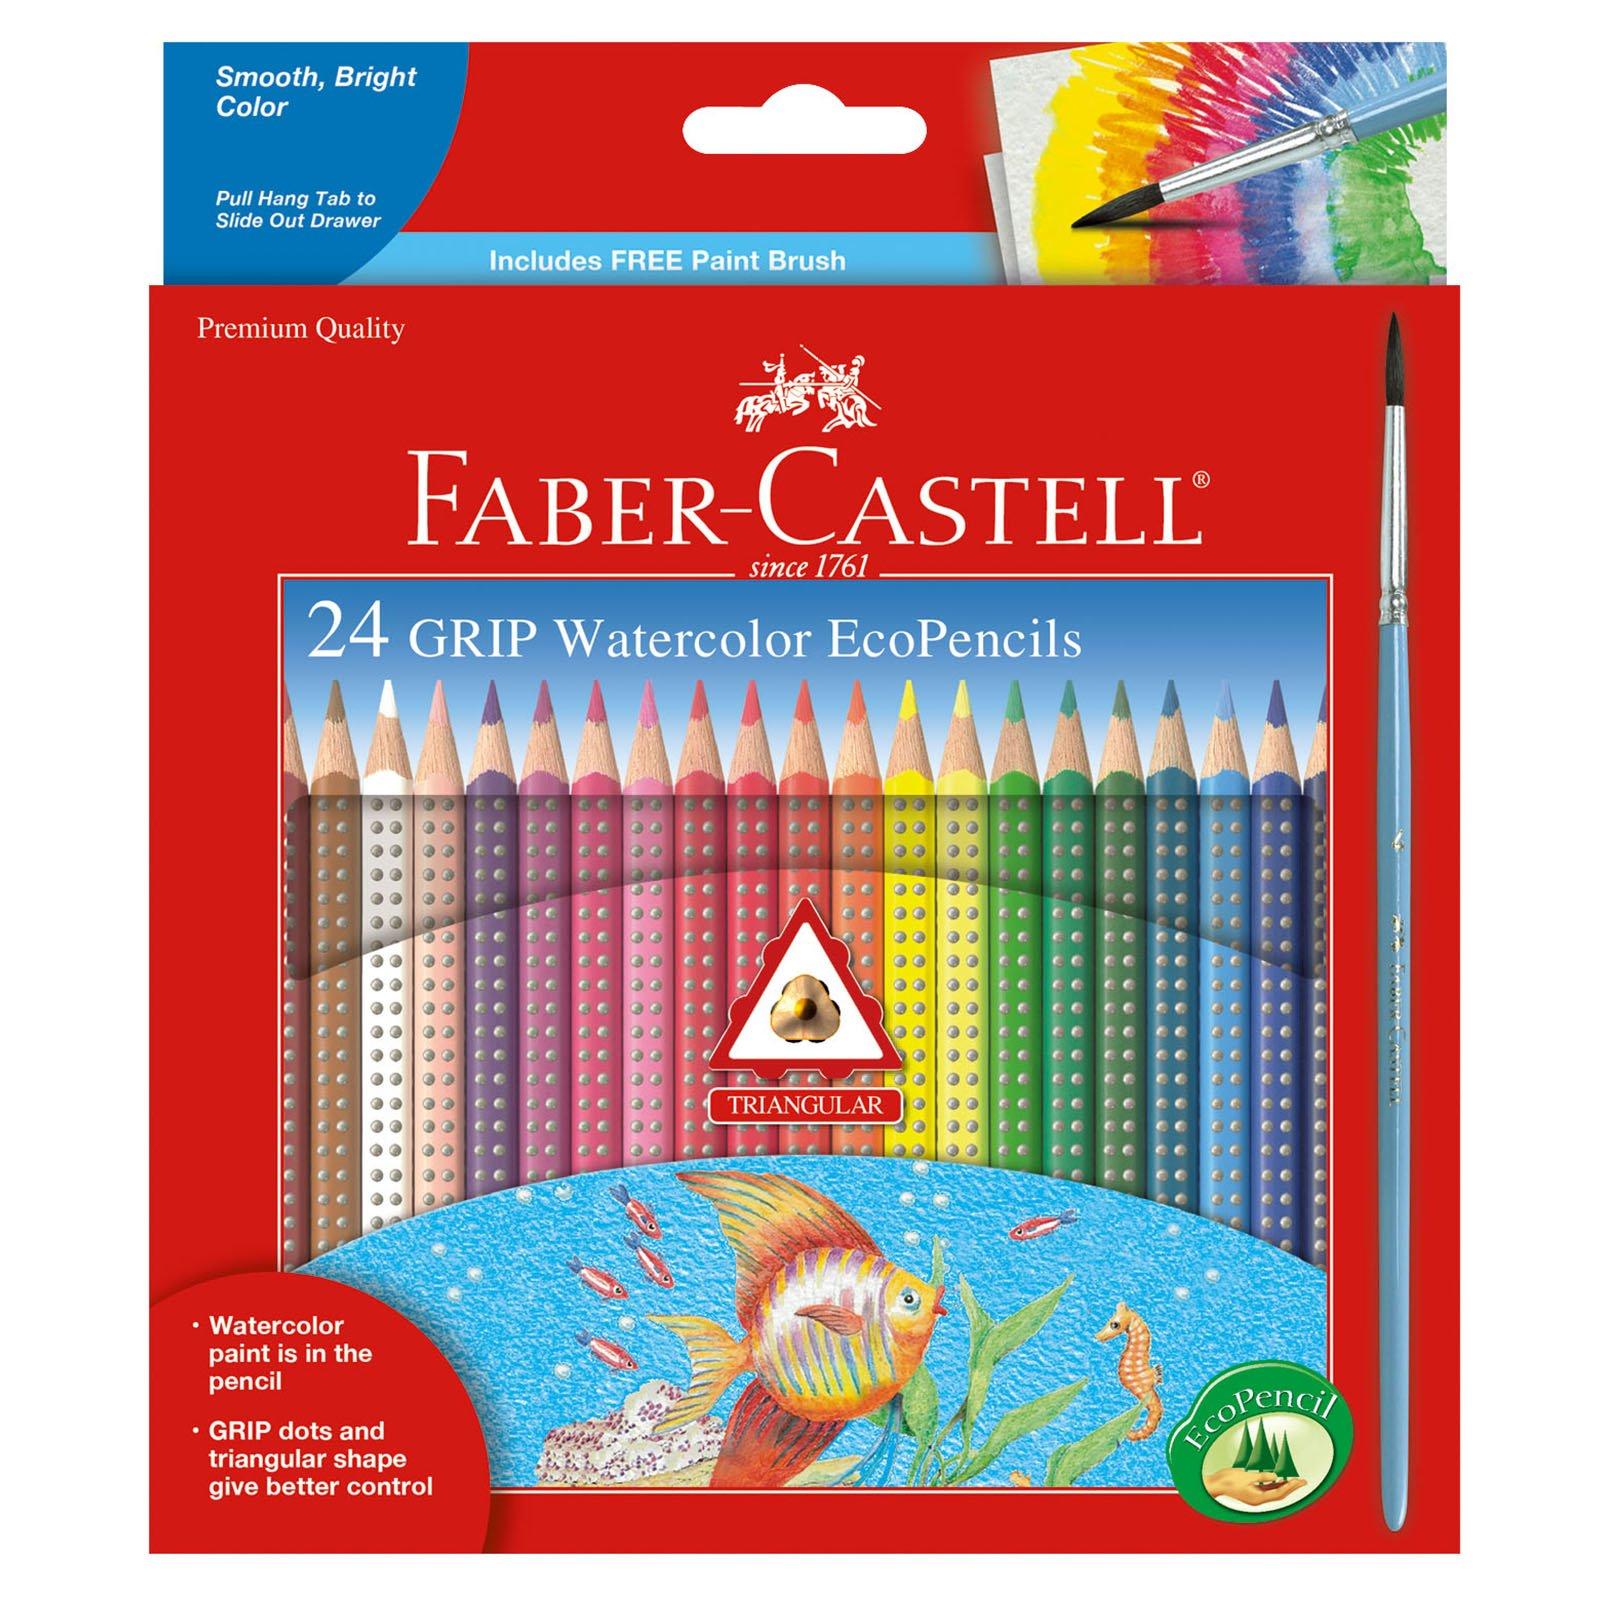 Faber Castell Watercolor EcoPencils Premium Supplies